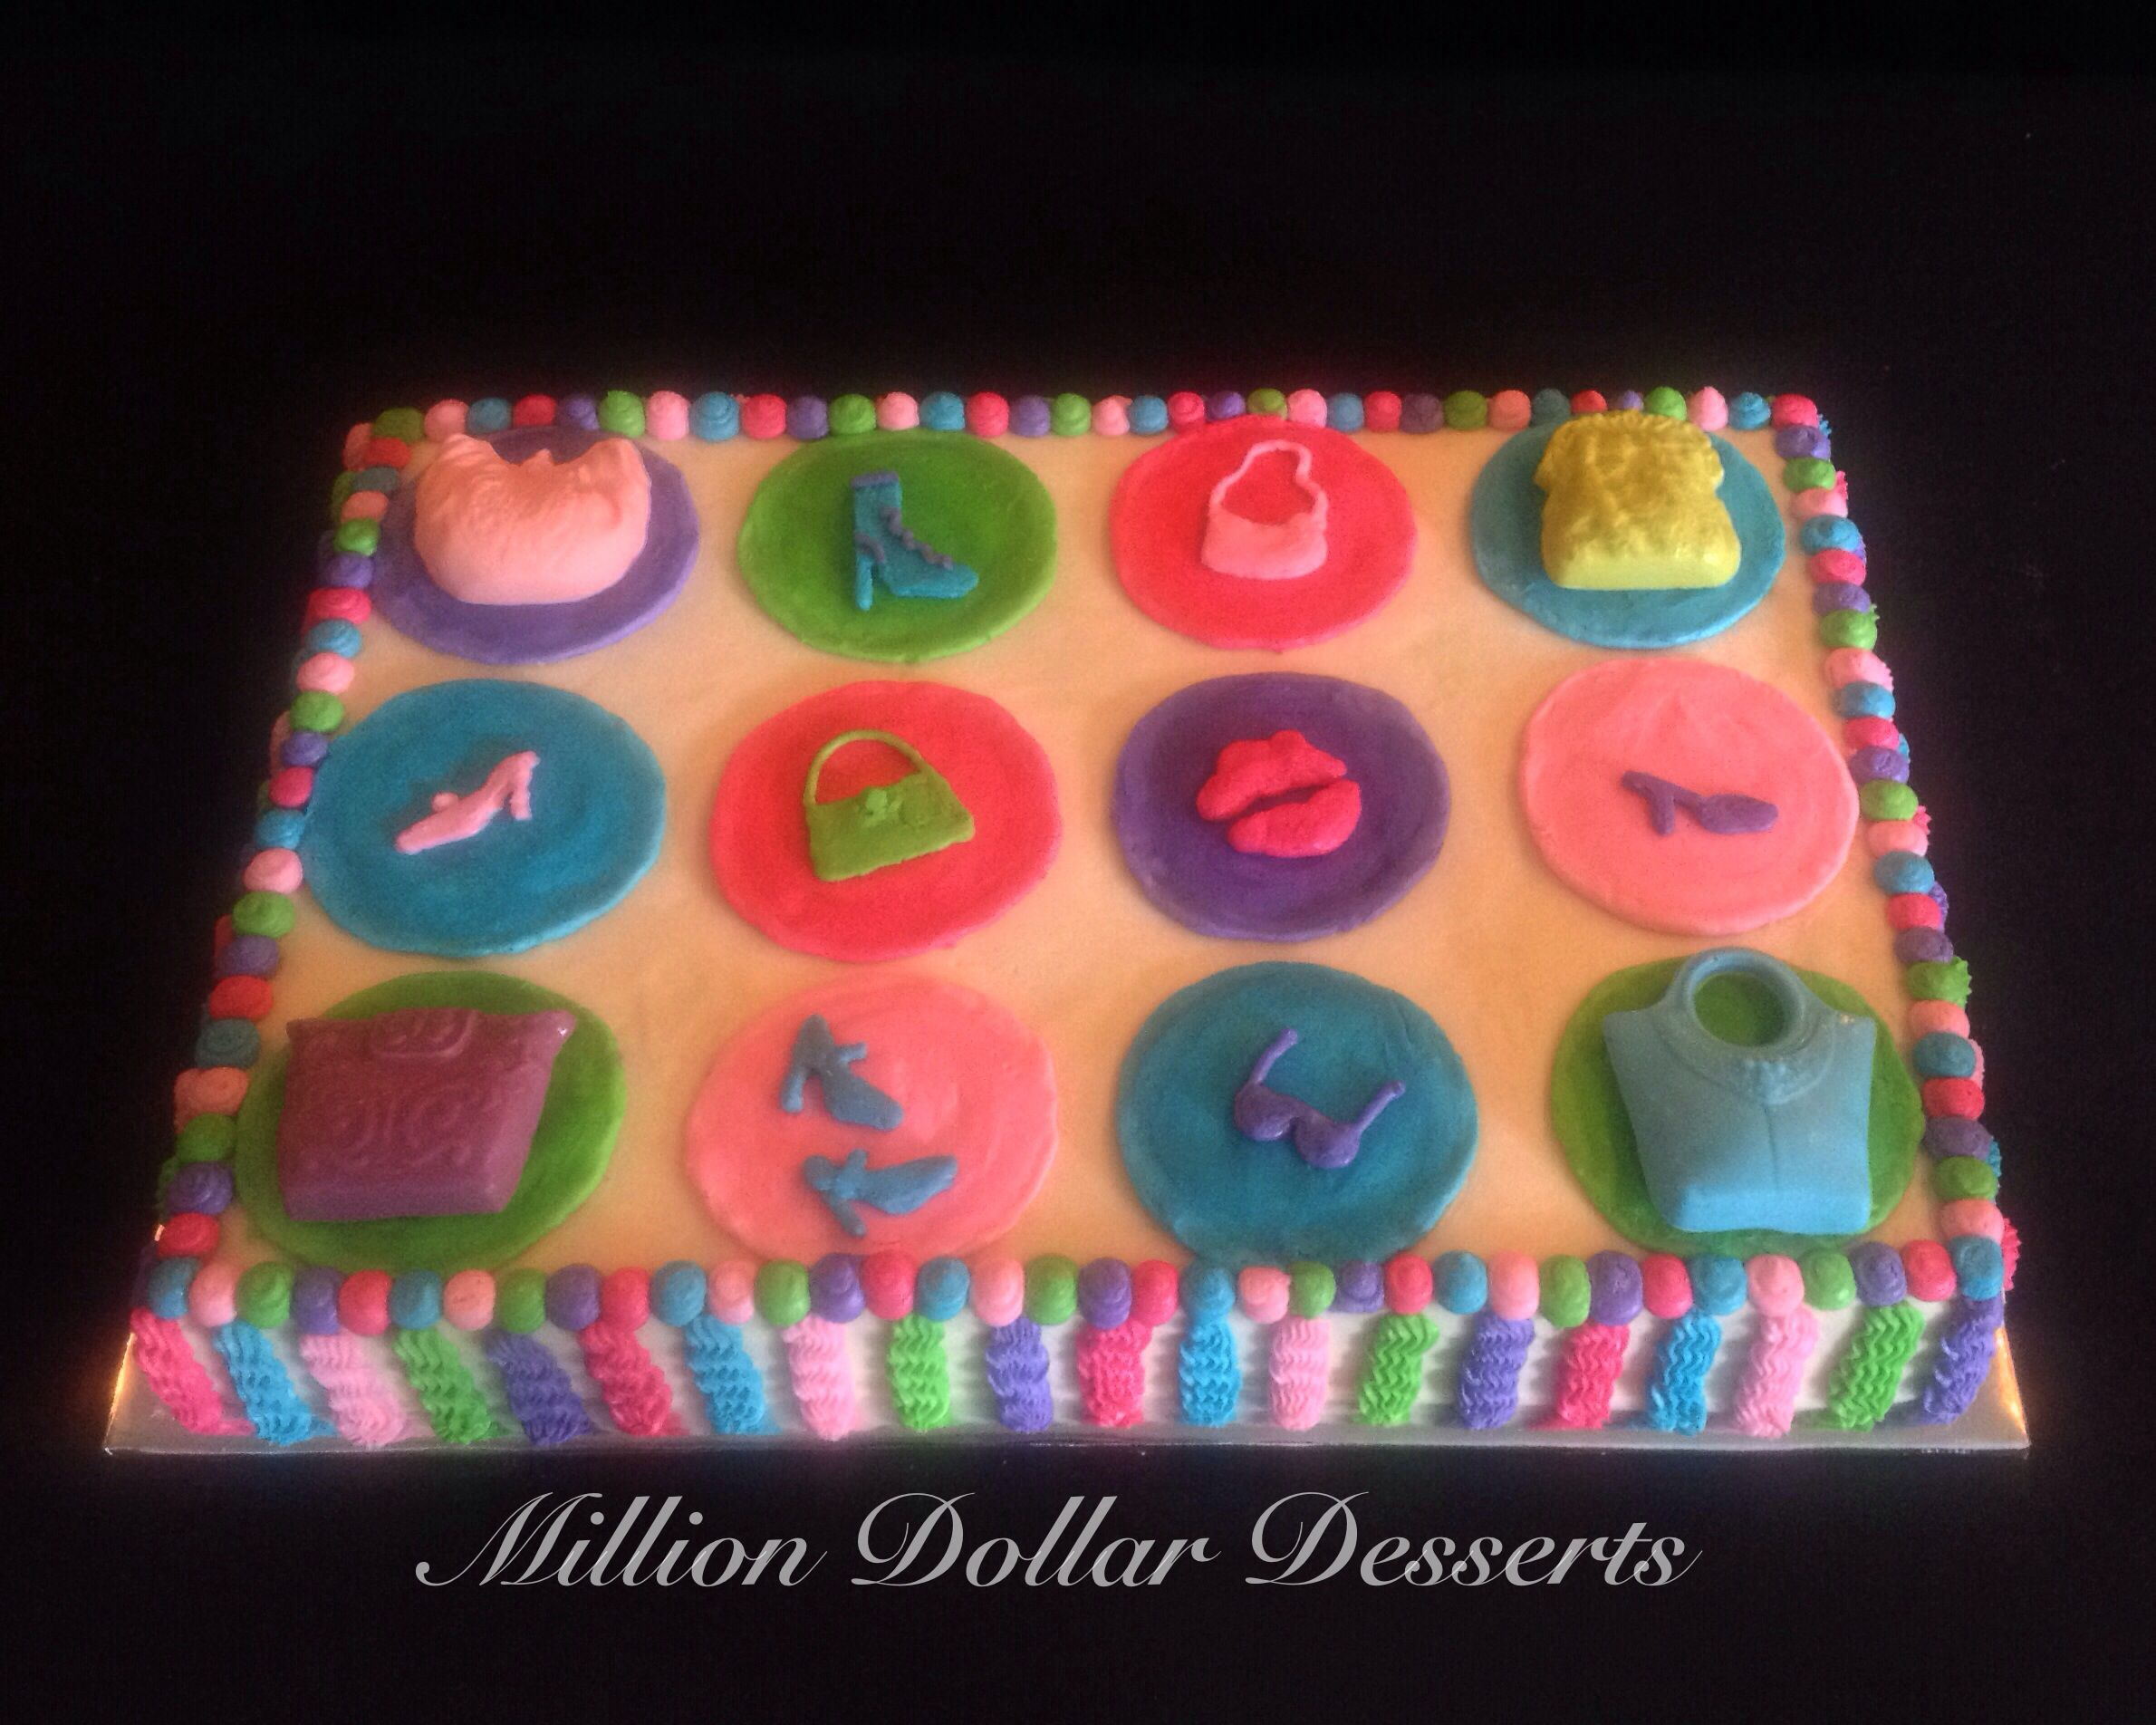 Barbie Theme Sheet Cake #MillionDollarDesserts Sheet ...